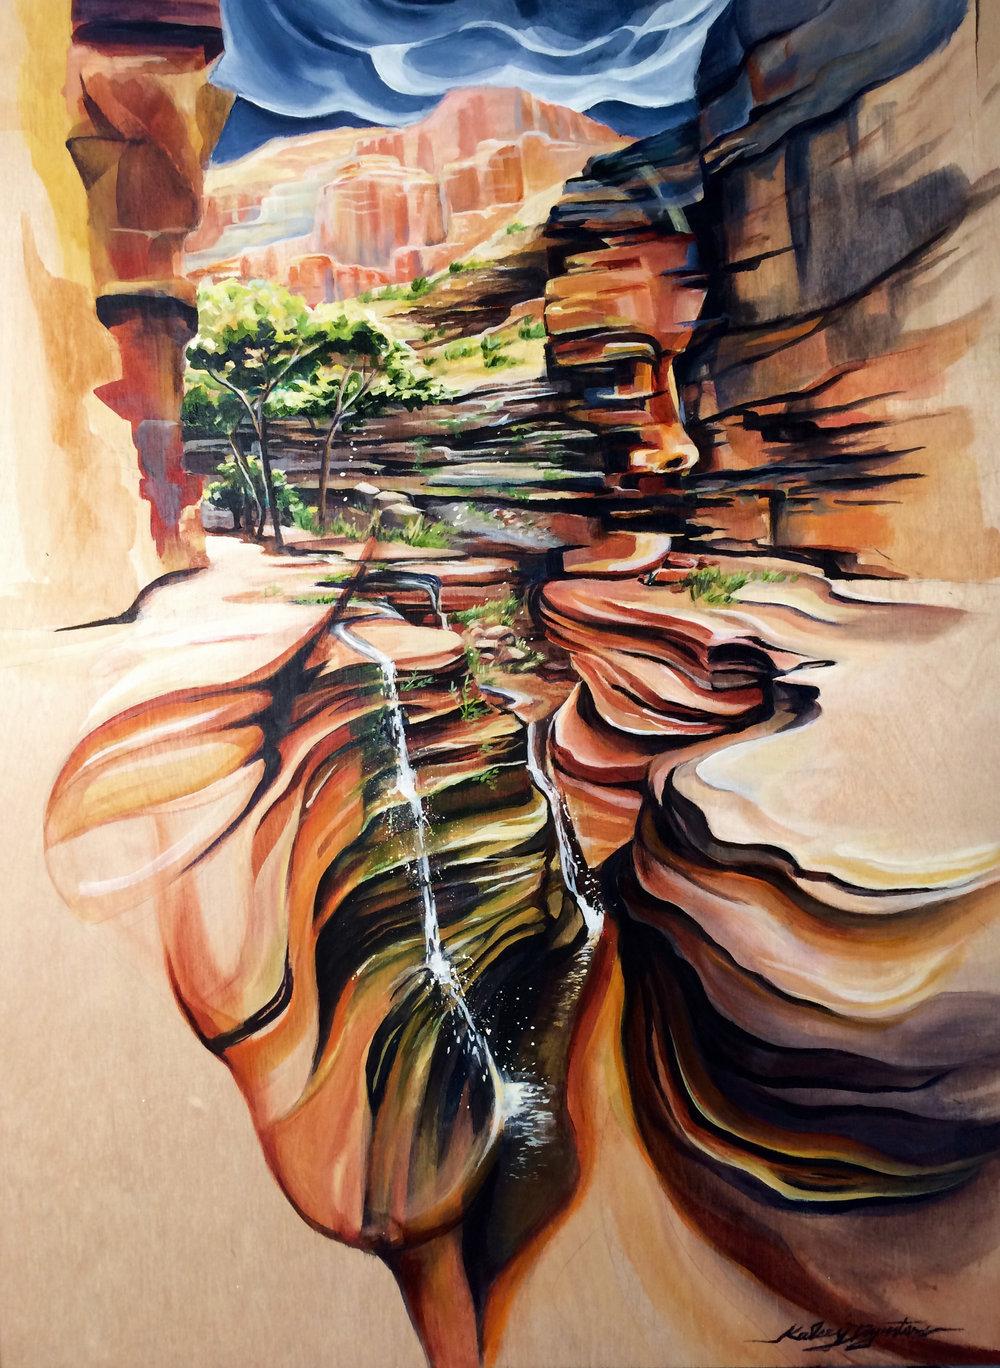 Into the Narrows, Deer Creek Falls, acrylic on wood, 18x24 - $500.00